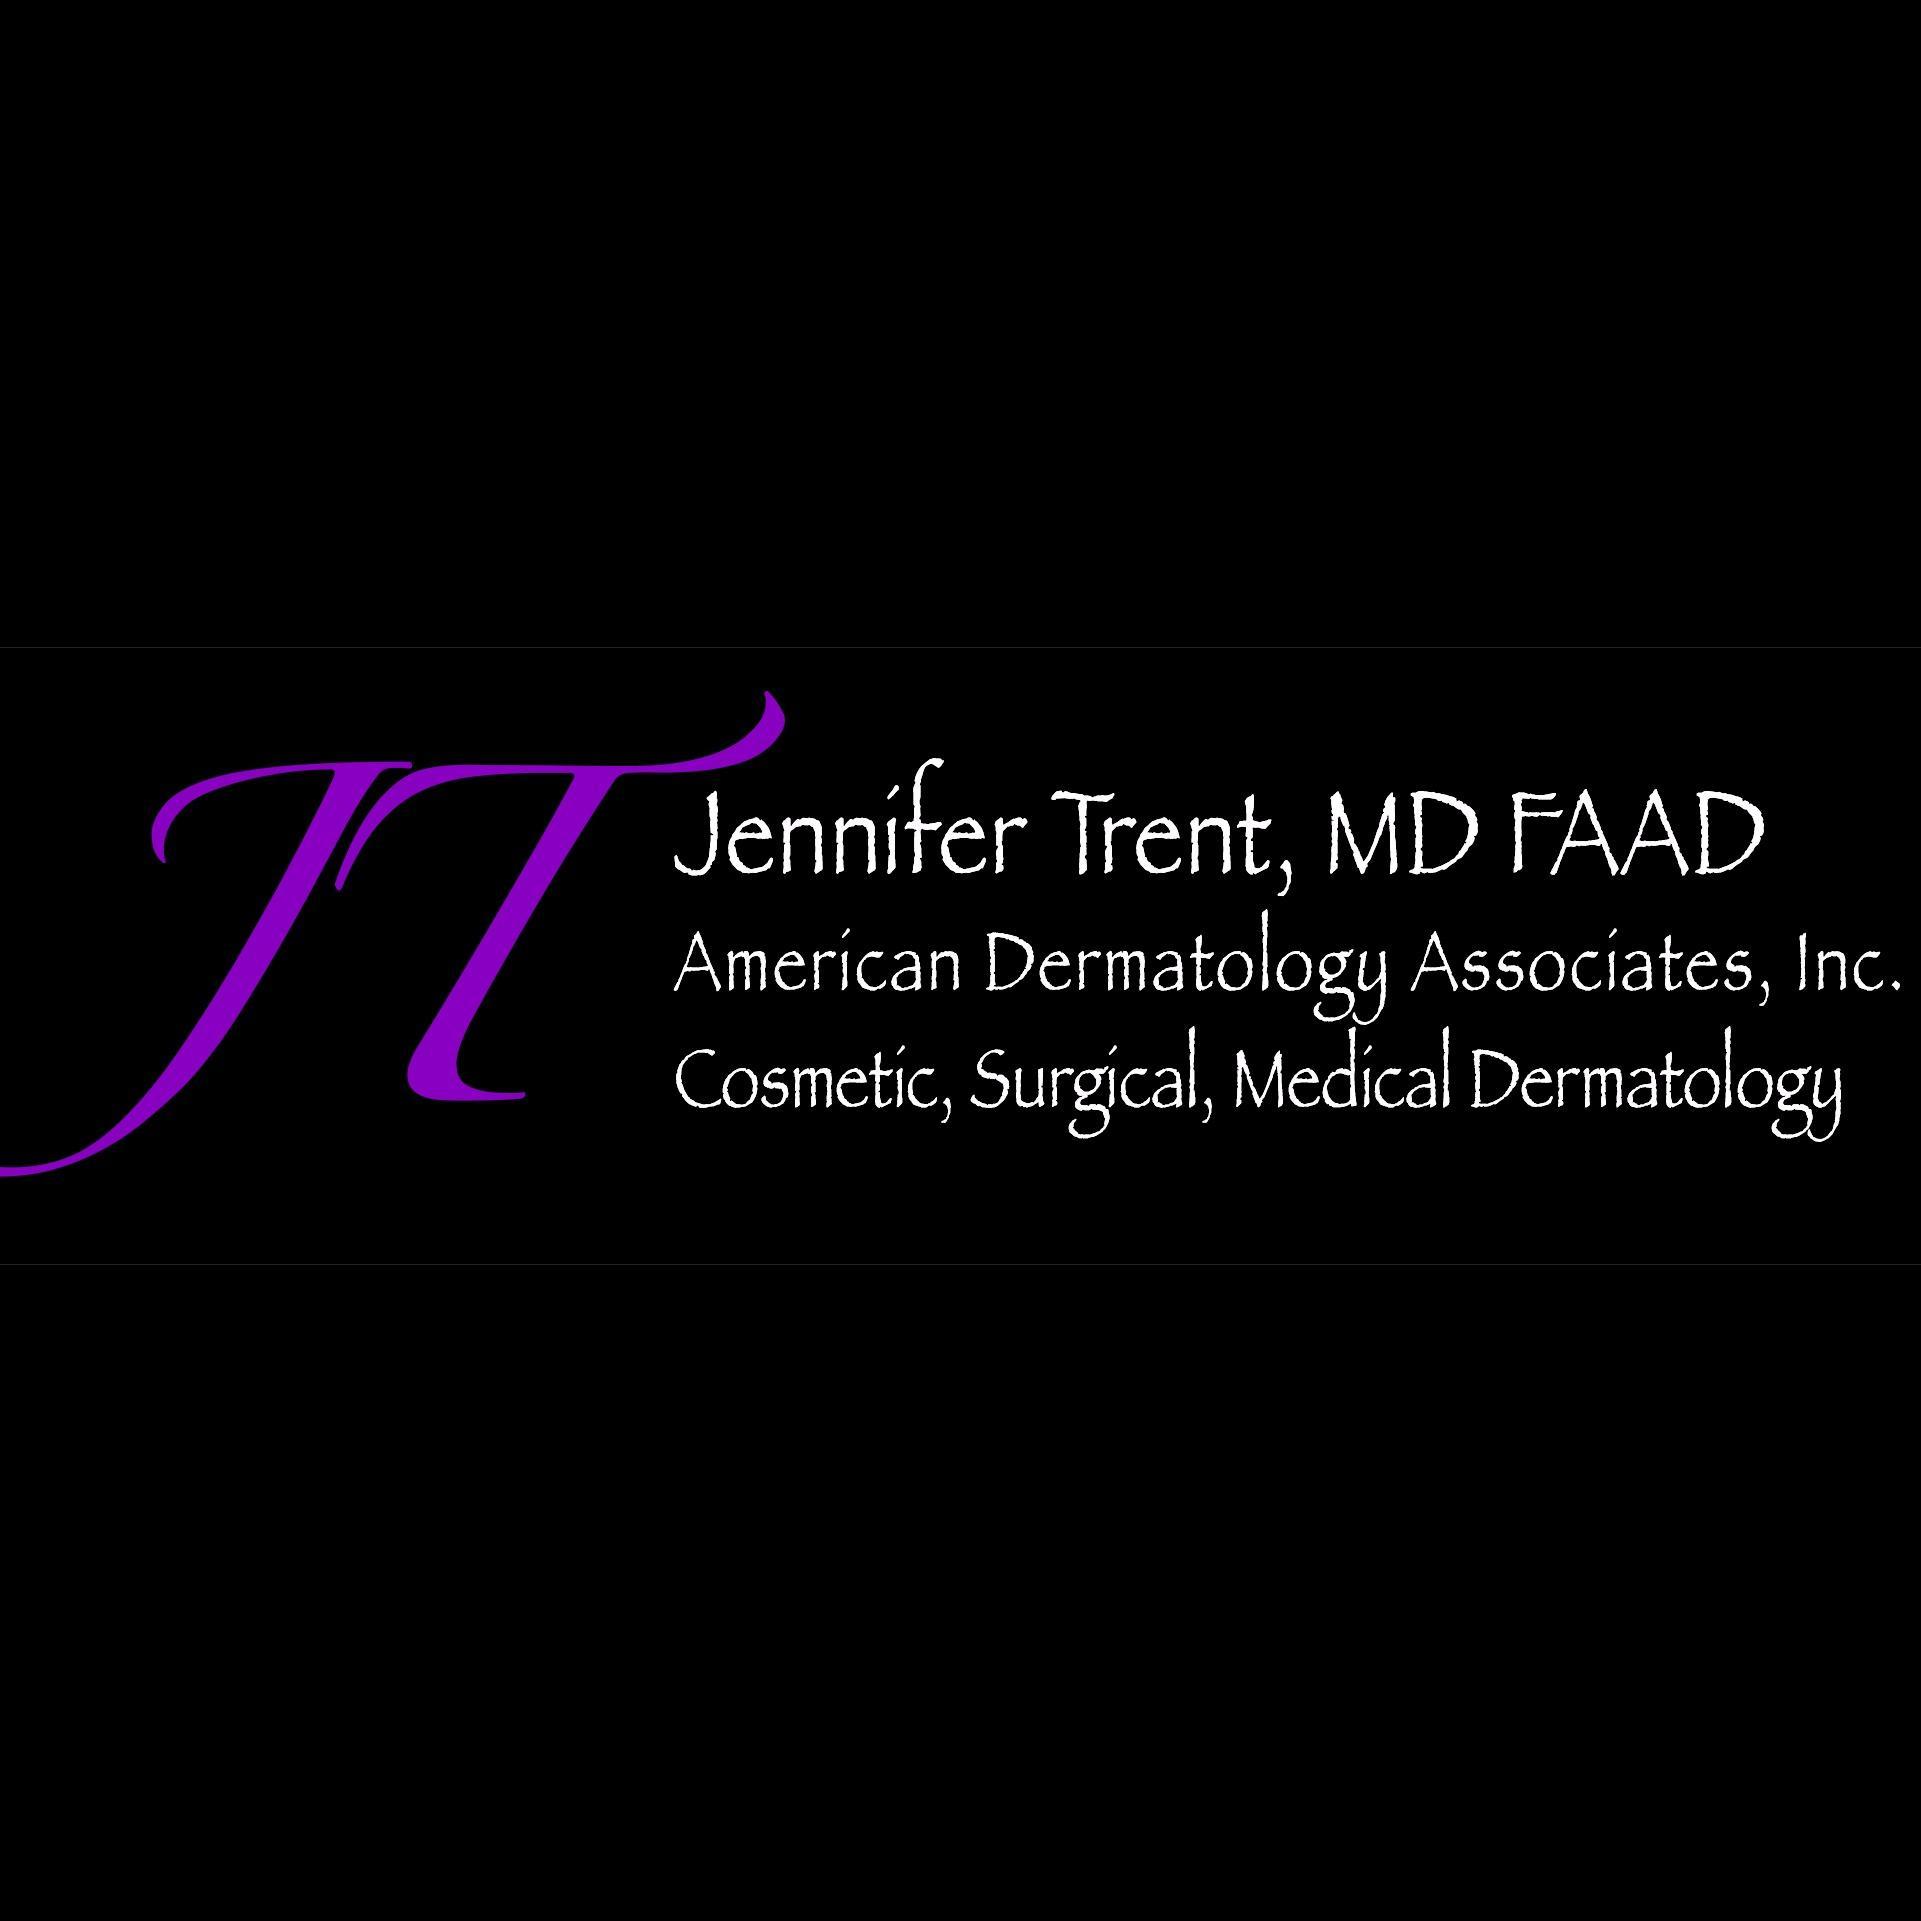 American Dermatology Associates, Inc.